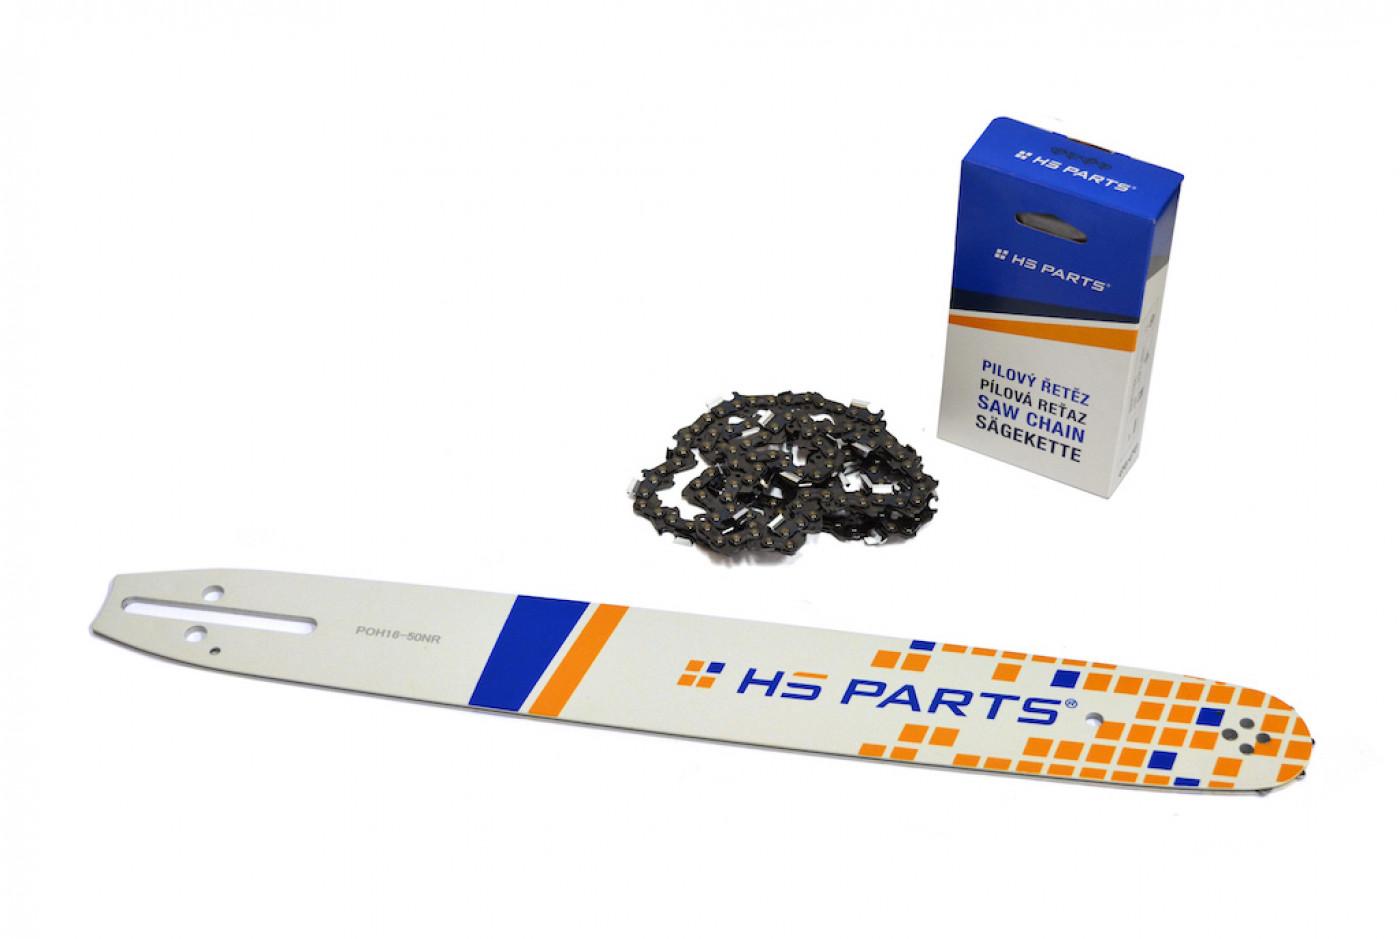 Lišta 40cm + reťaz 56 čl. 3/8 1,3mm pre Partner 350 351 370 390 420